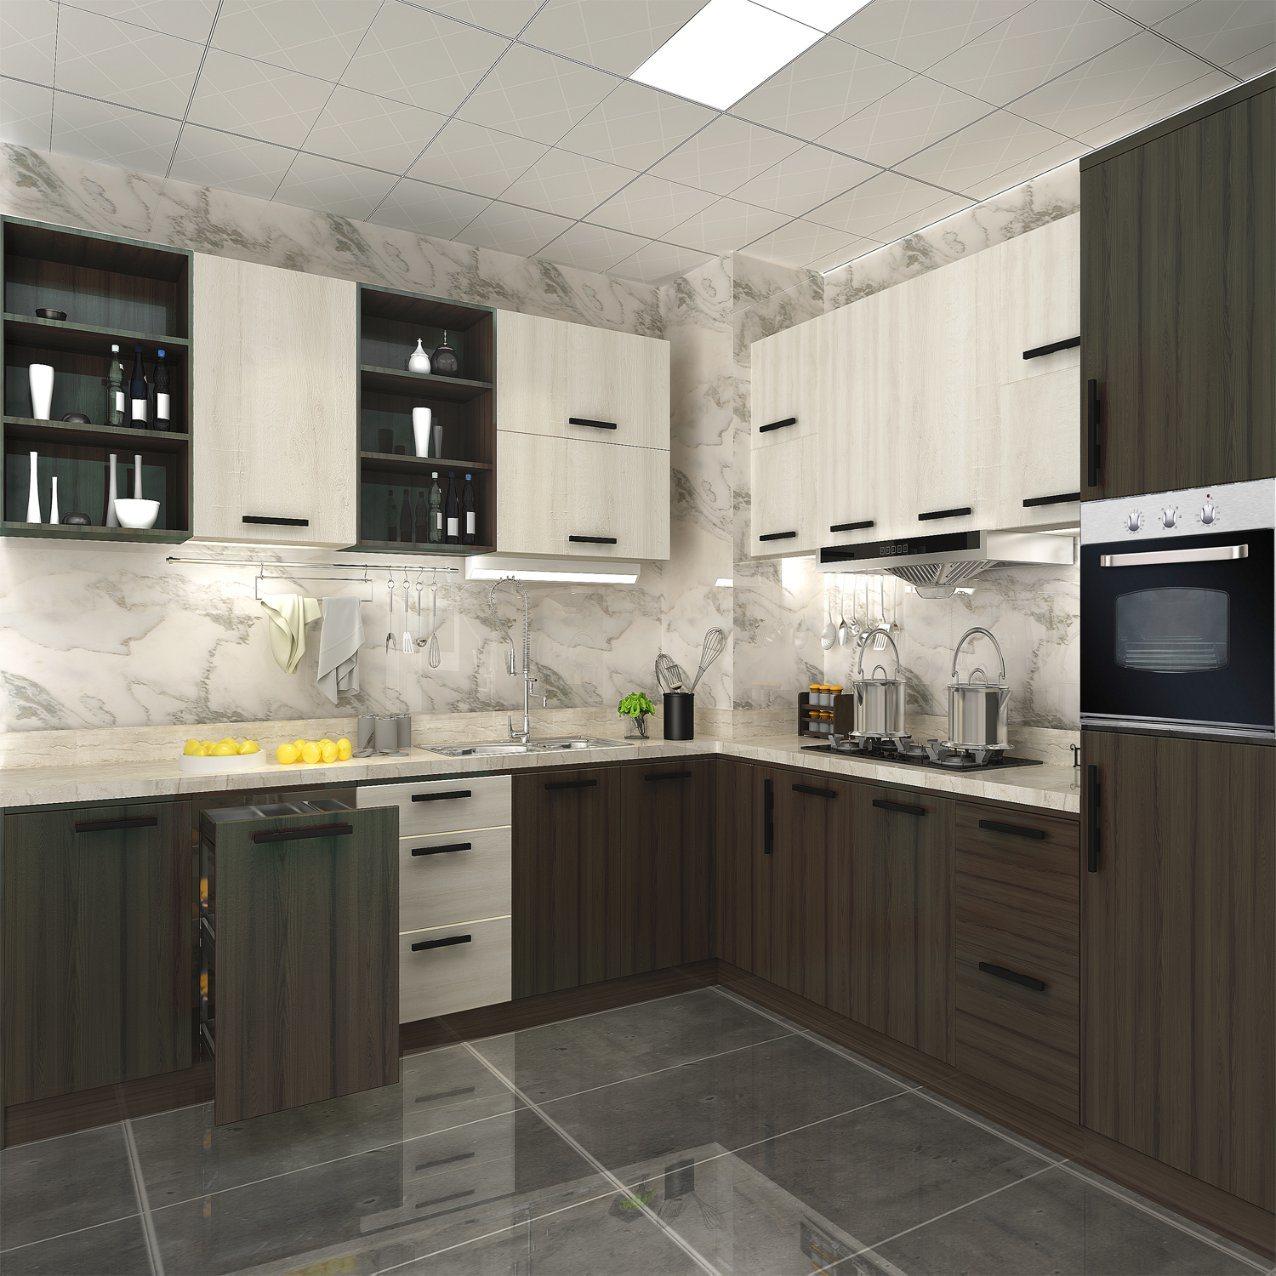 Best Price Kitchen Cabinets China New Modern Best Price Kitchen CabiDesign kitchen